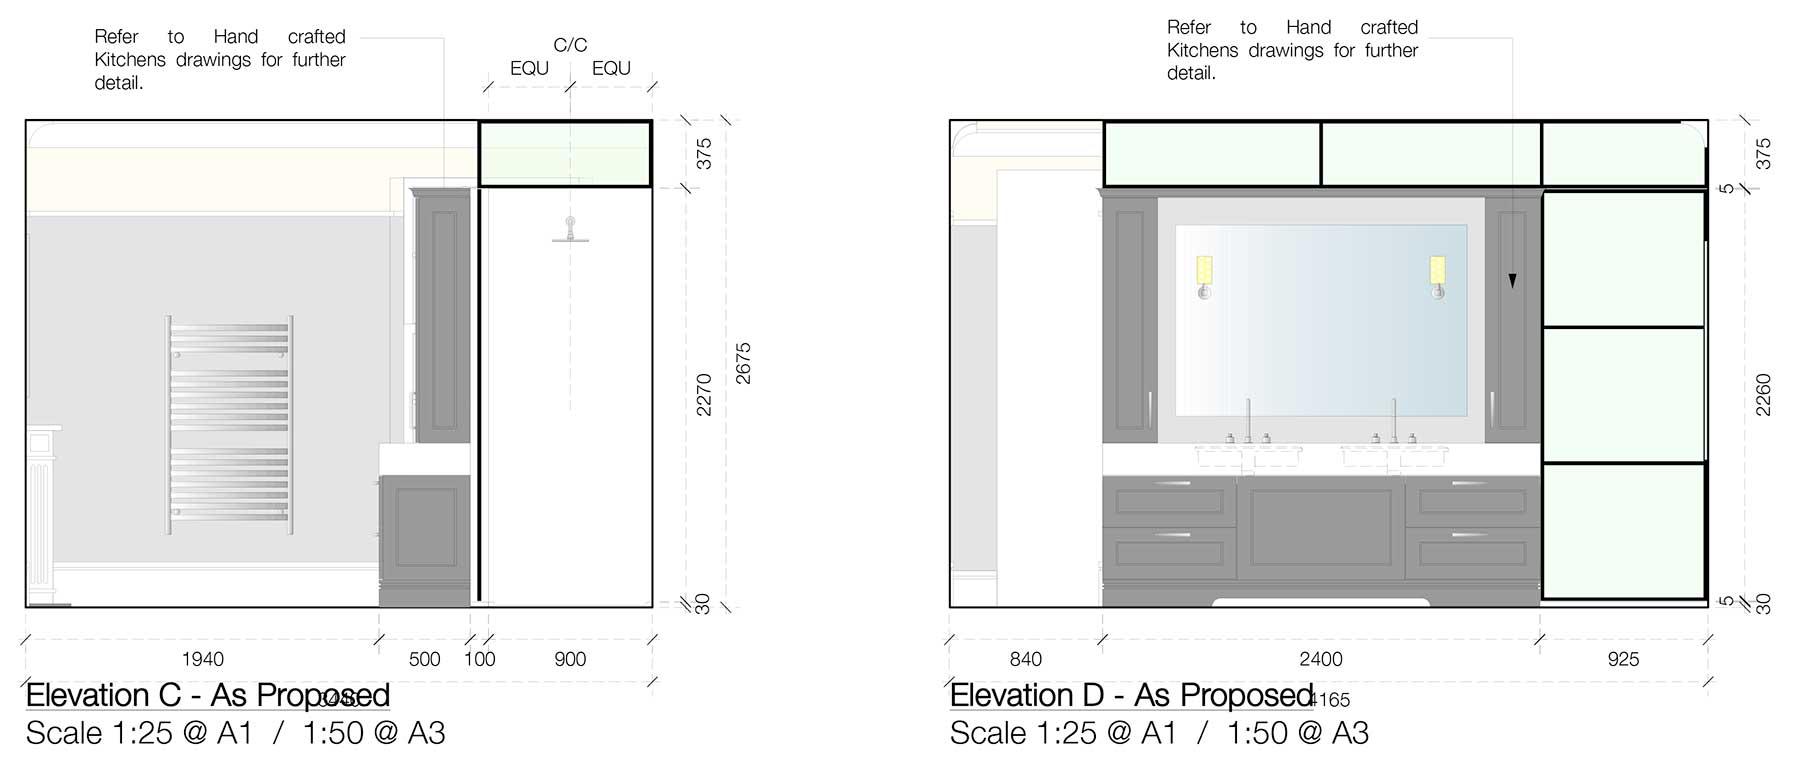 client plan elevations